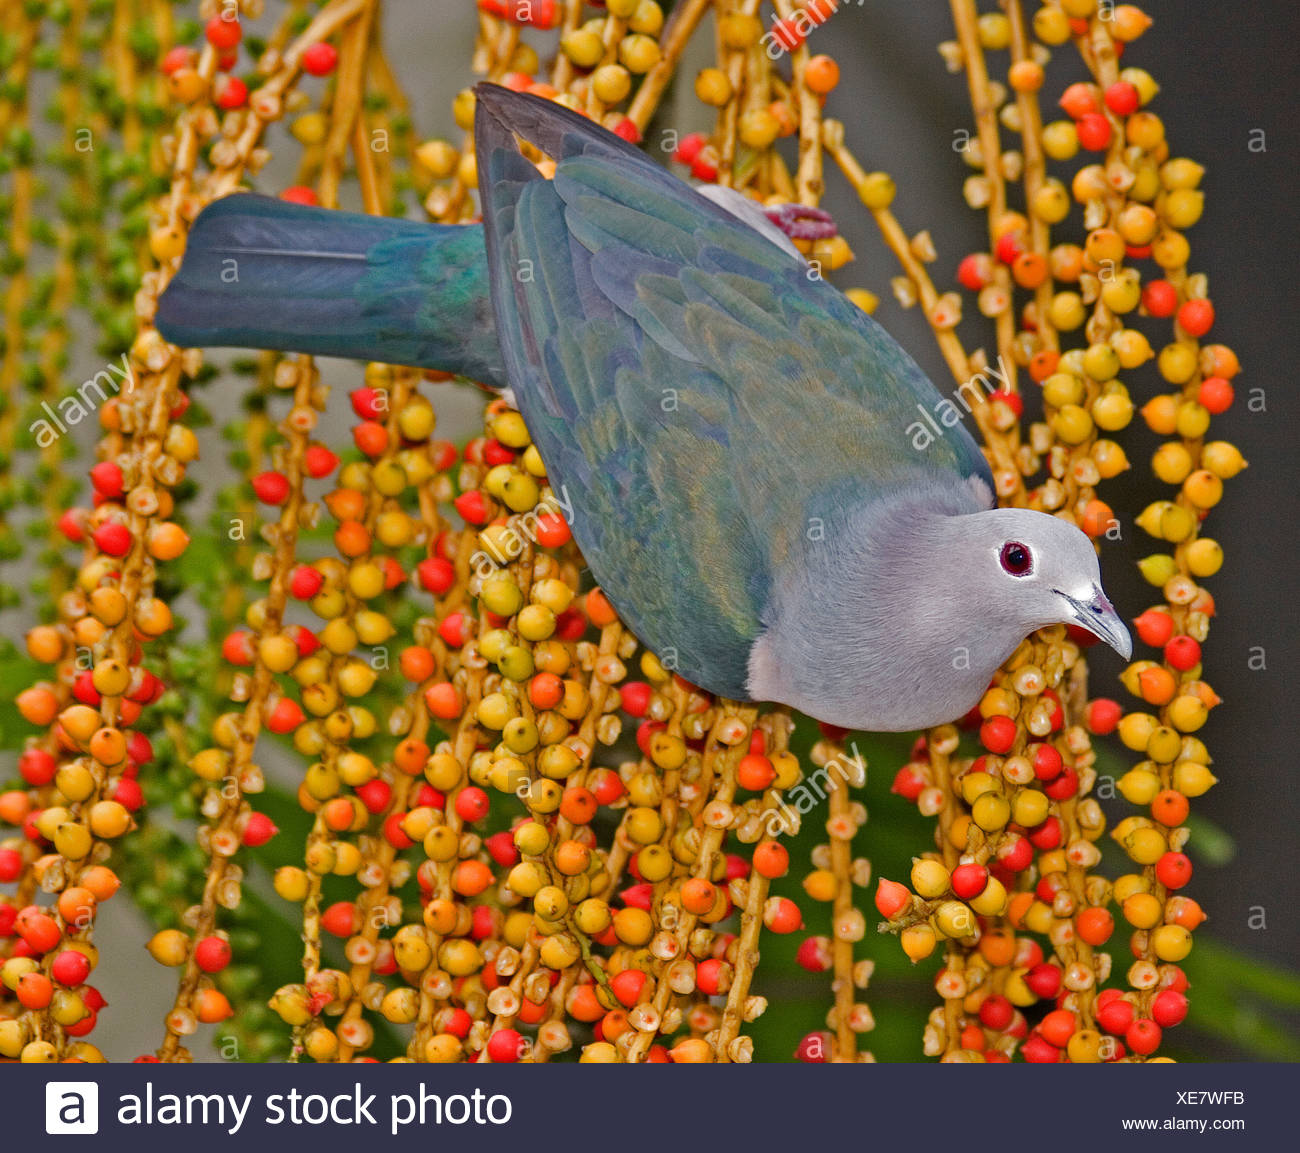 Green imperial pigeon ducula aenea Sri Lanka - Stock Image